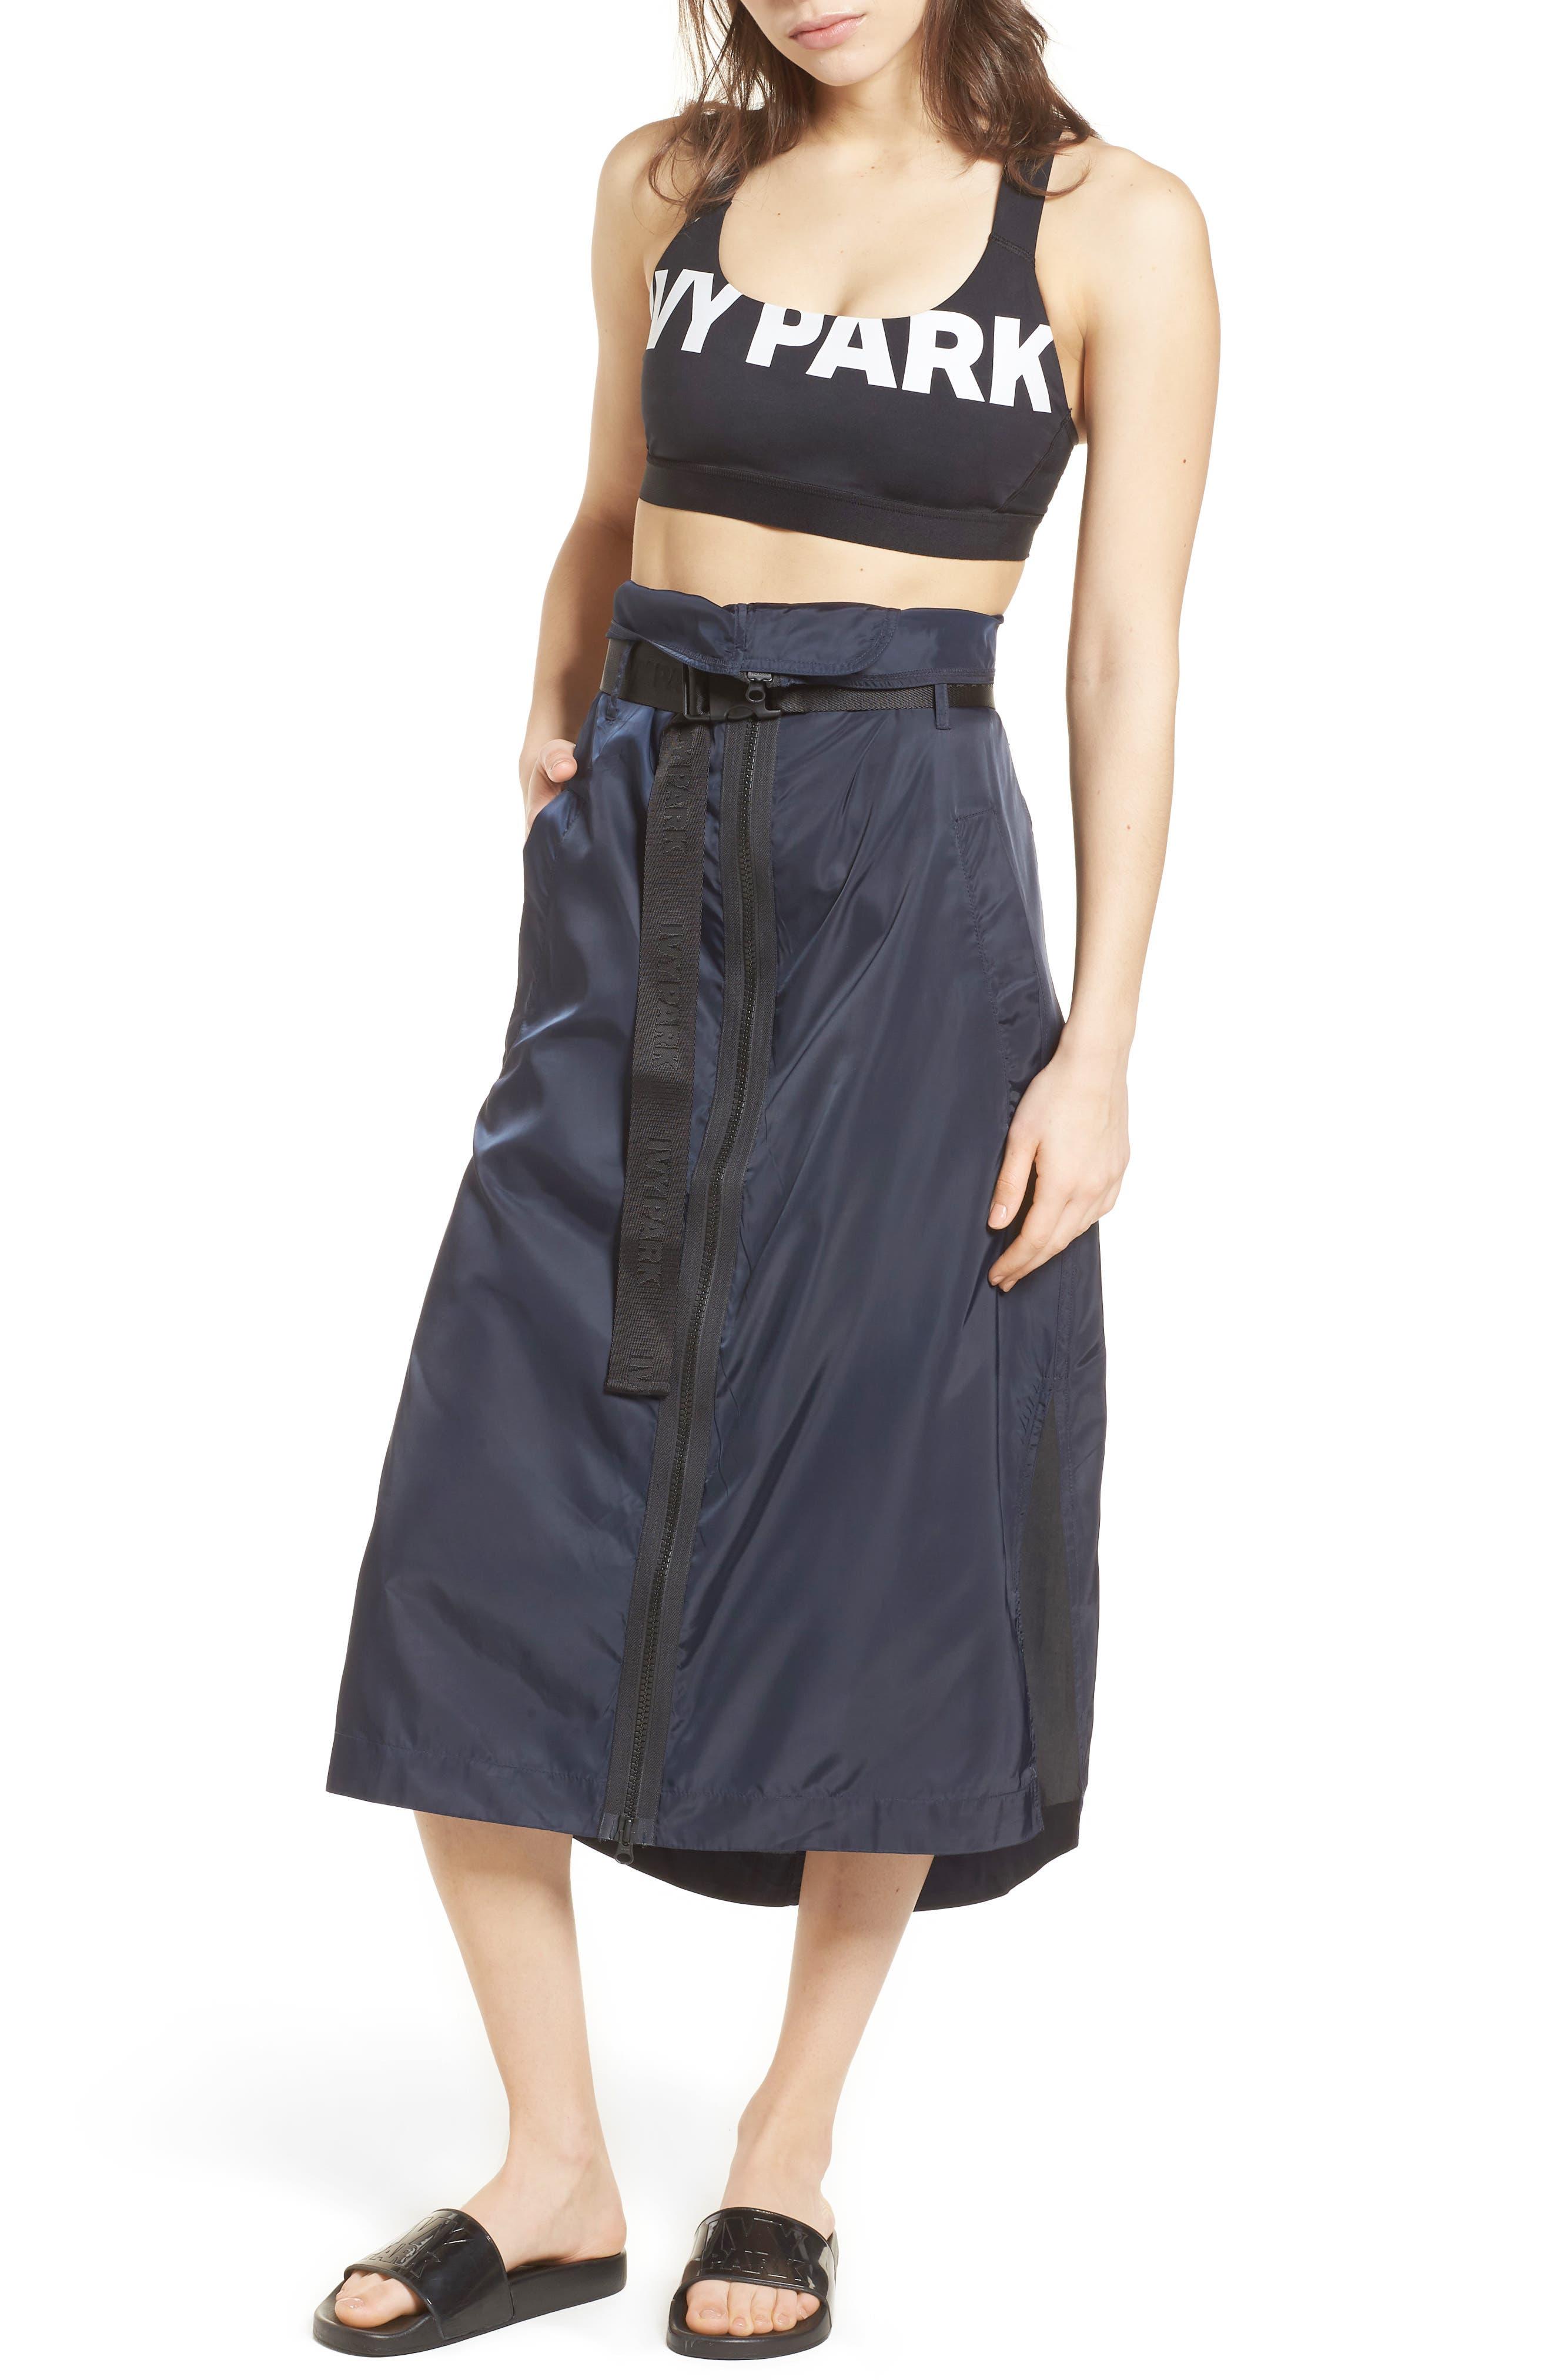 IVY PARK® Harness Skirt